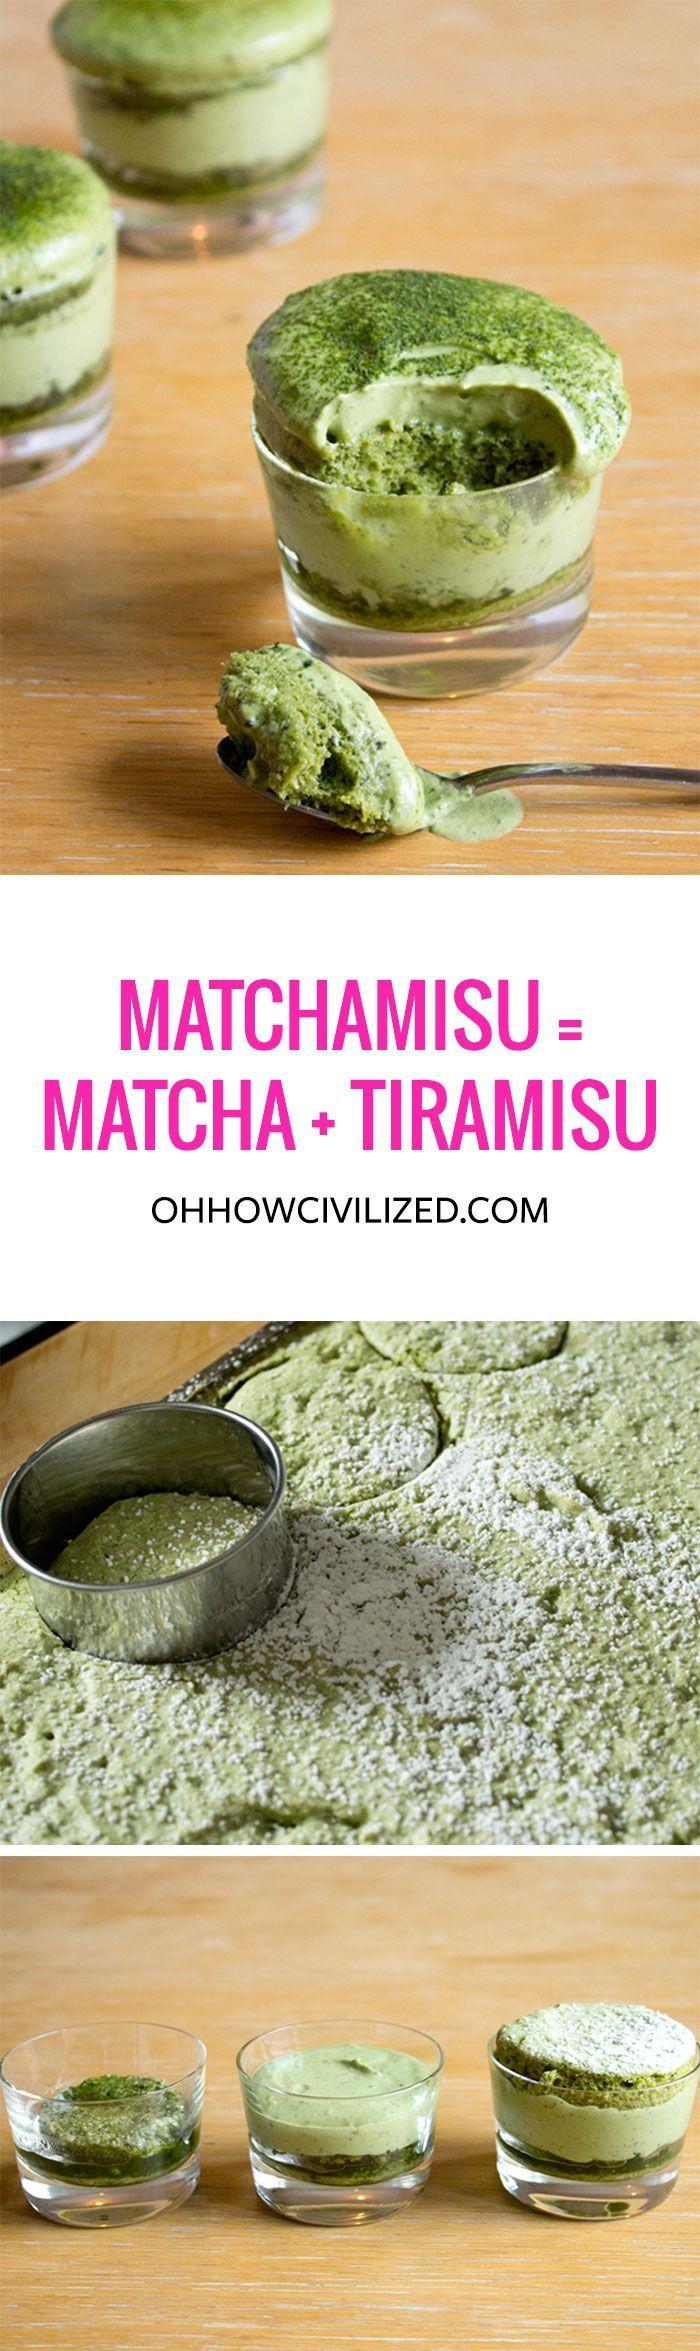 Matchamisu = #Matcha (#Green #Tea) + Tiramisu...I do love tiramisu! Does this mean it's healthy now?! ;)